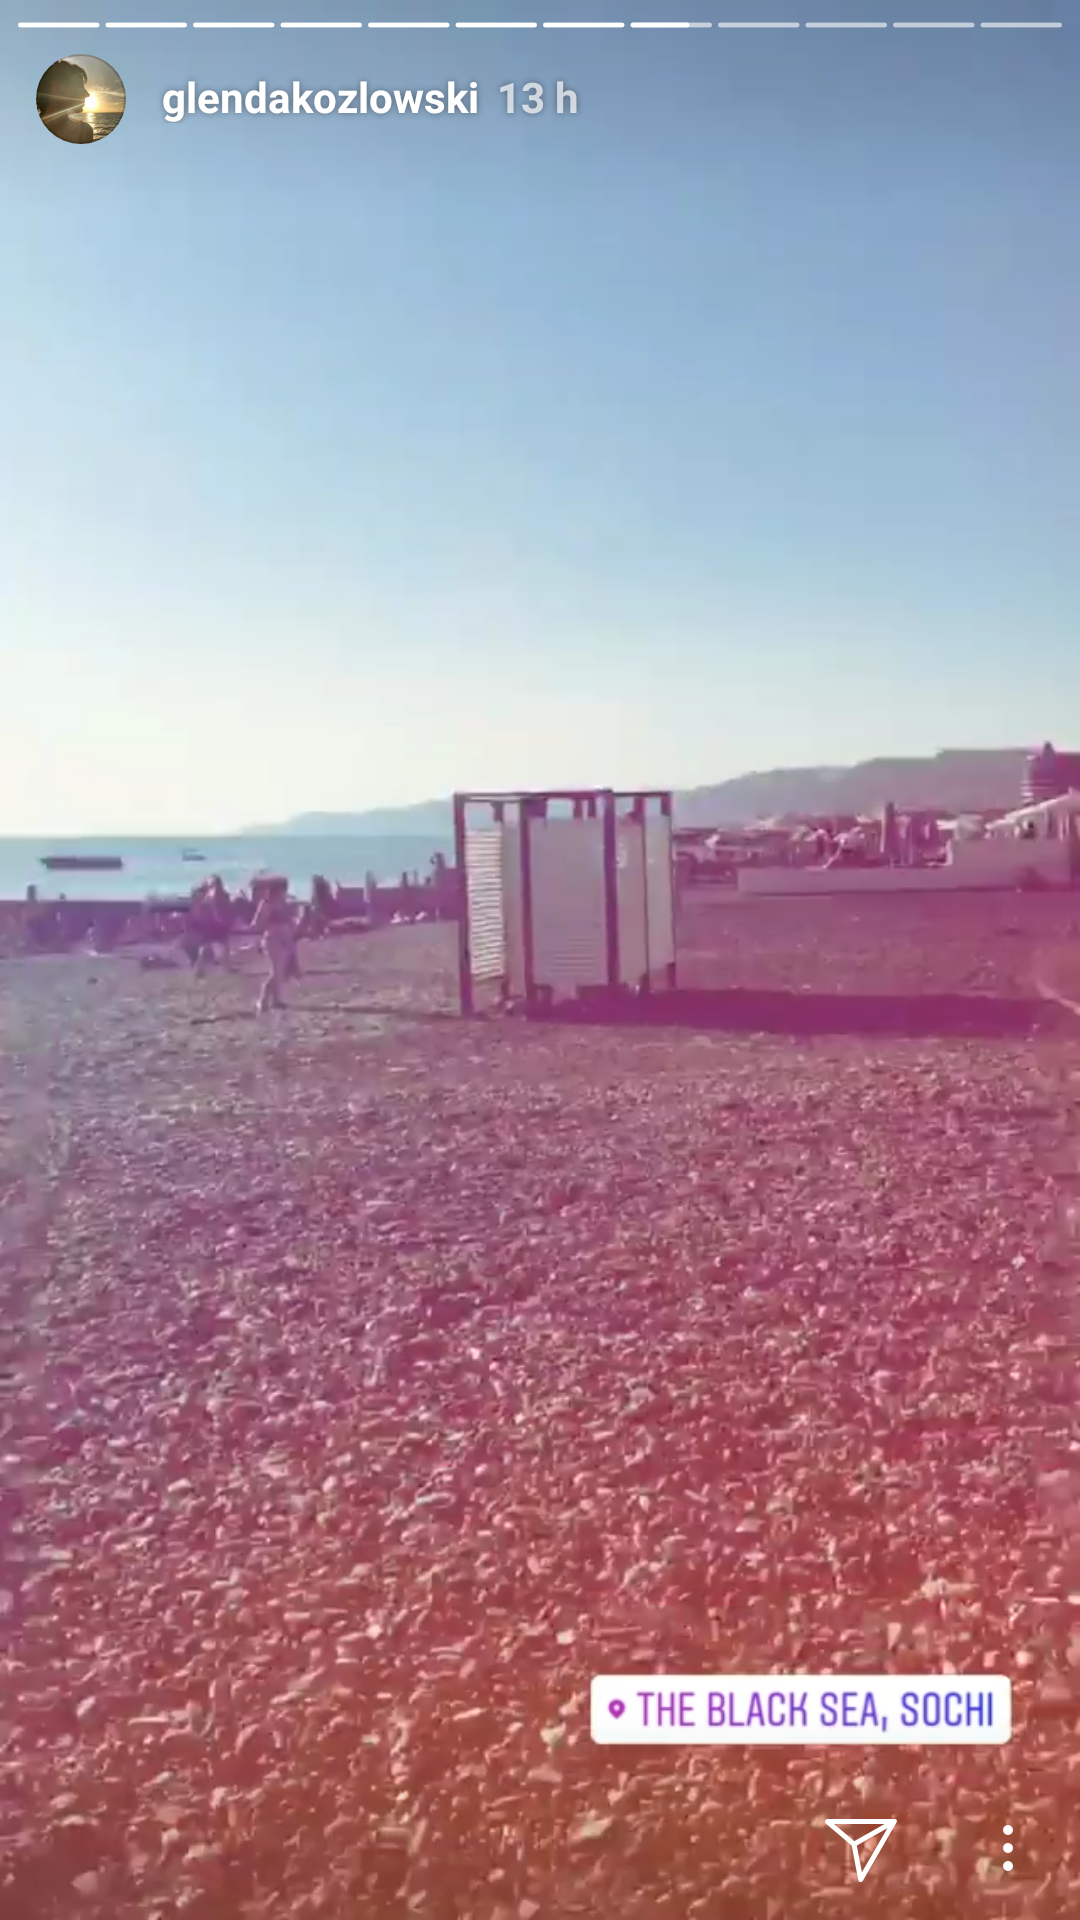 stories glenda kozlowski na praia de sochi - vestiário - cabine - areia